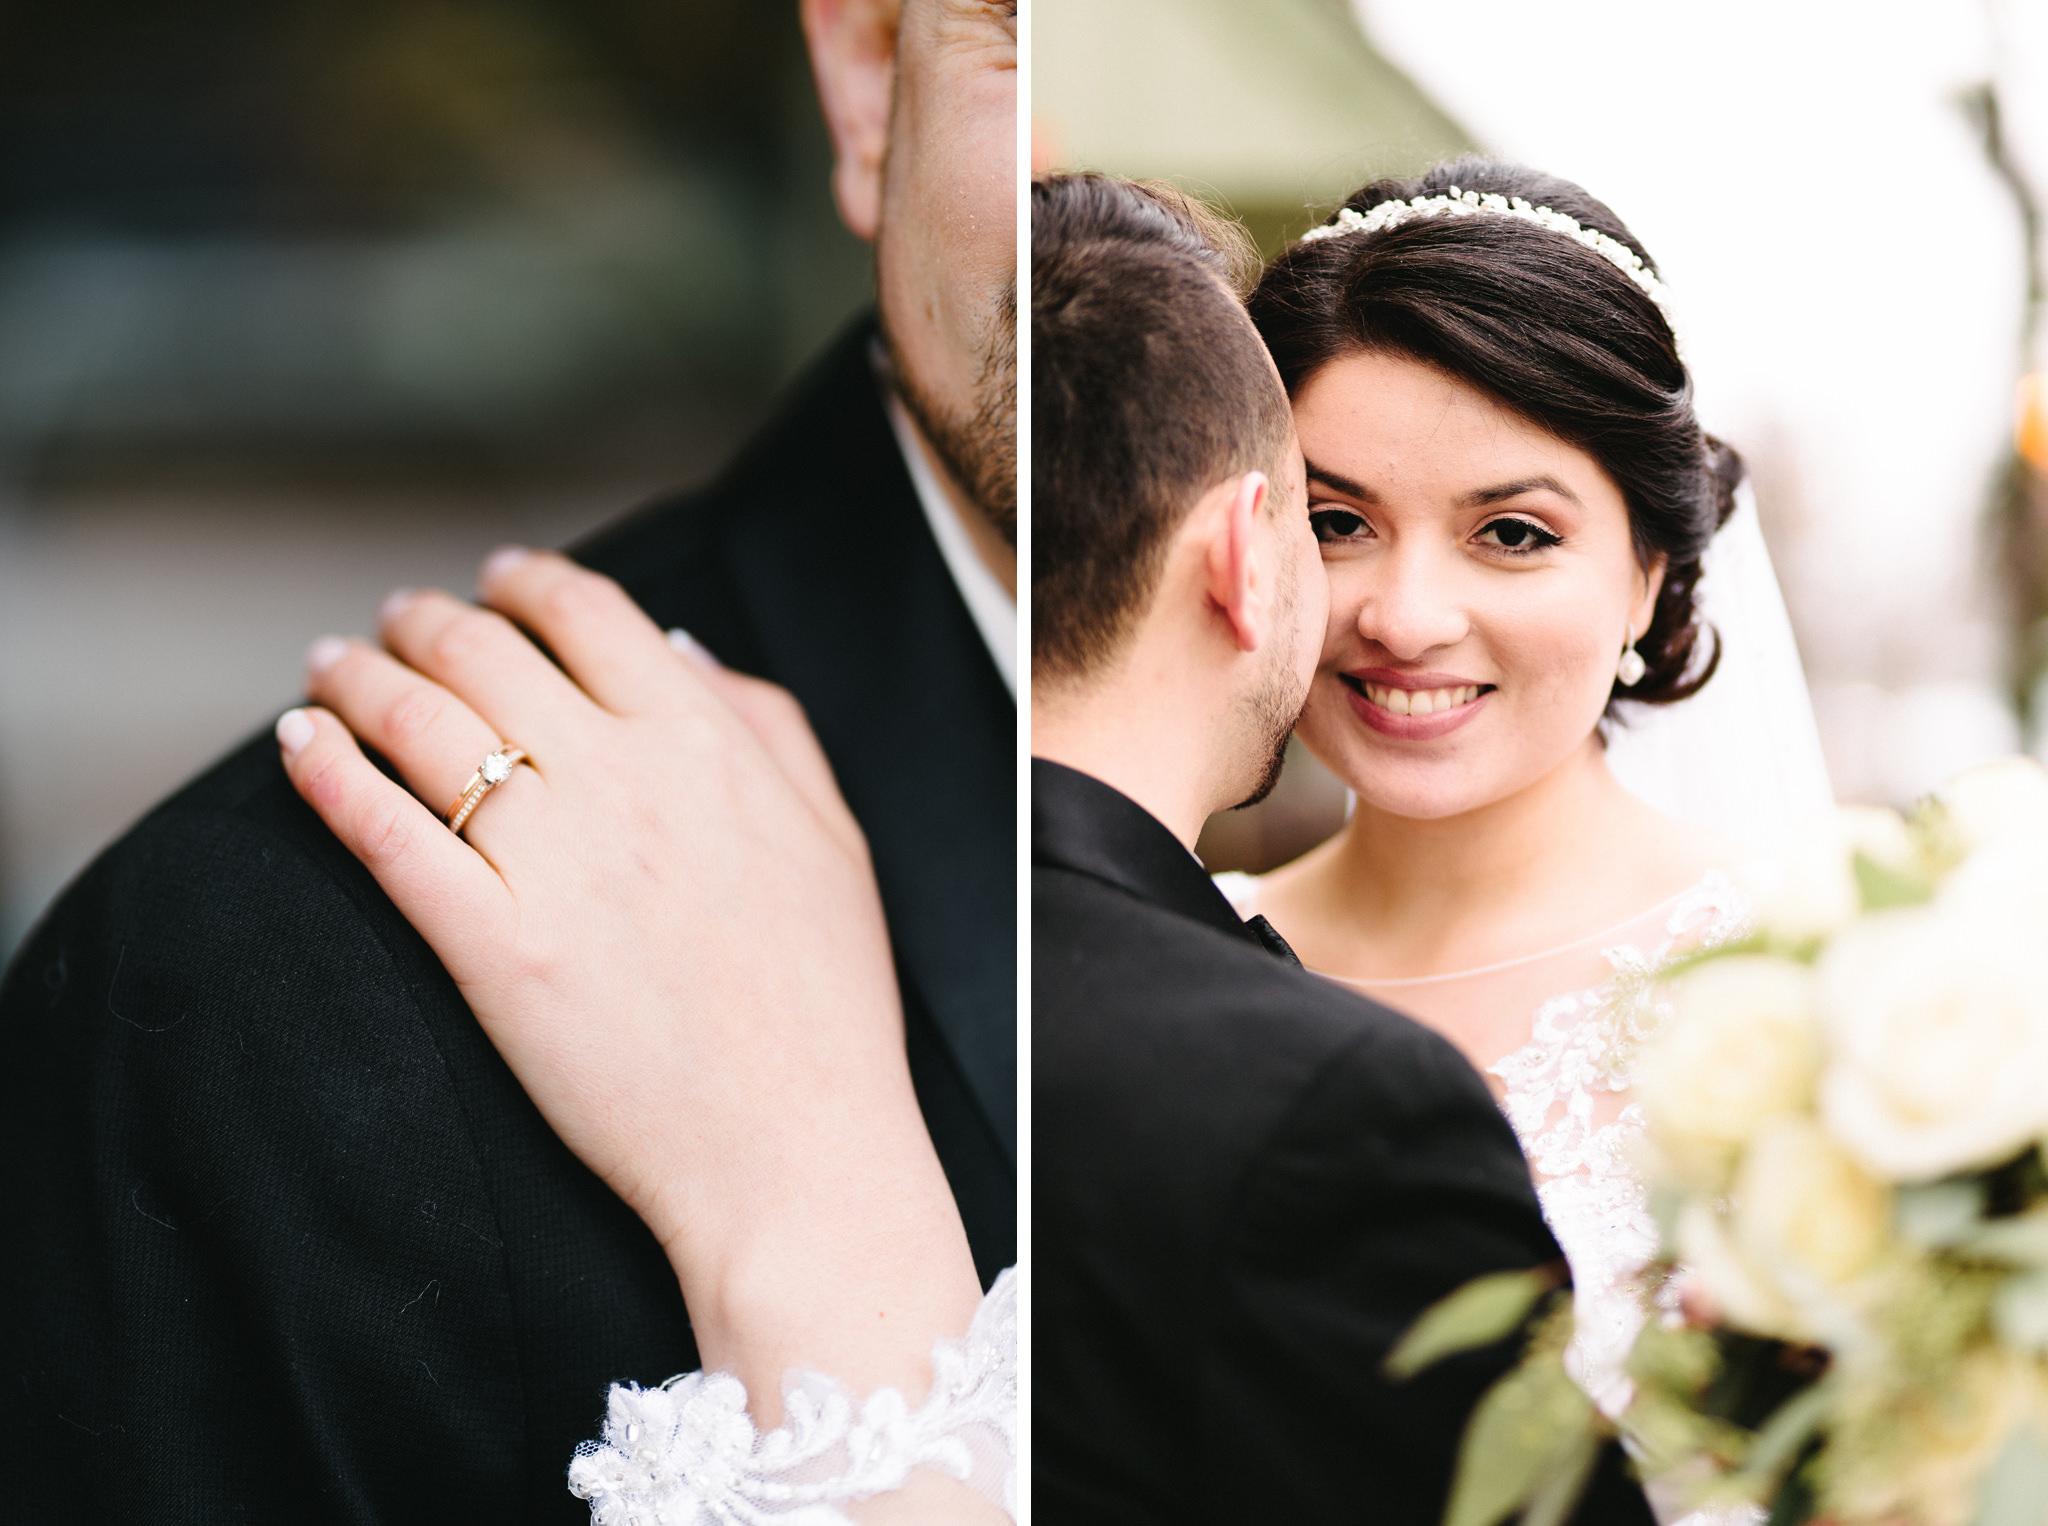 027-rempel-photography-chicago-wedding-inspiration-susan-daniel-michigan-metro-detroit-christian-church-holly-vault-cupcakes-and-kisses.jpg